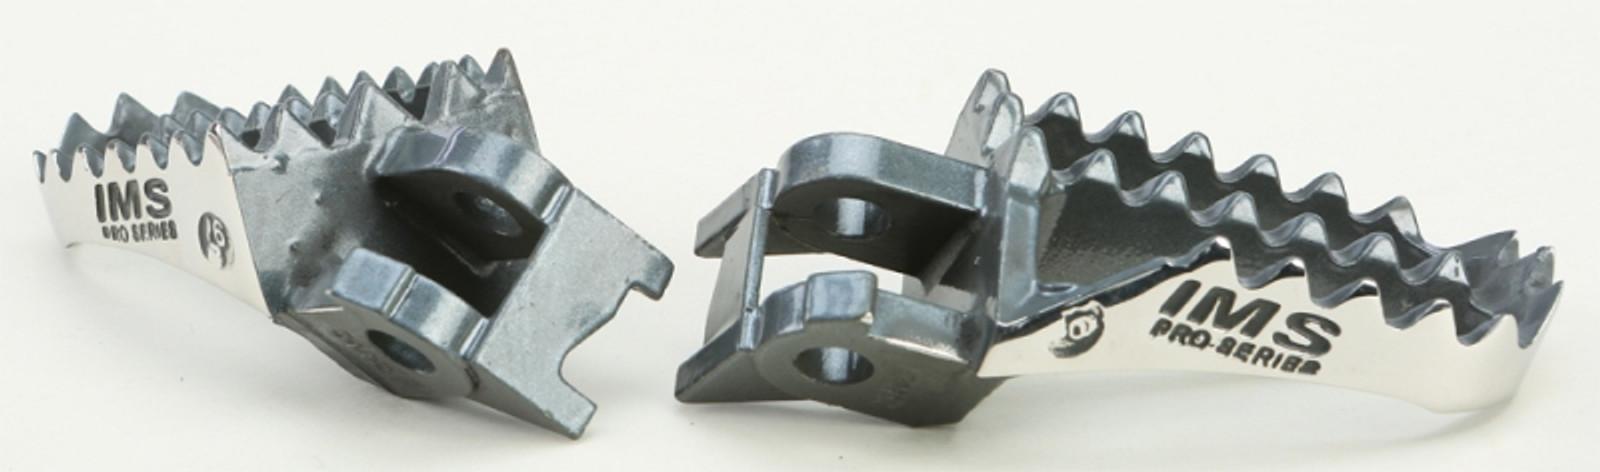 IMS 292211-4 Pro Series Footpegs